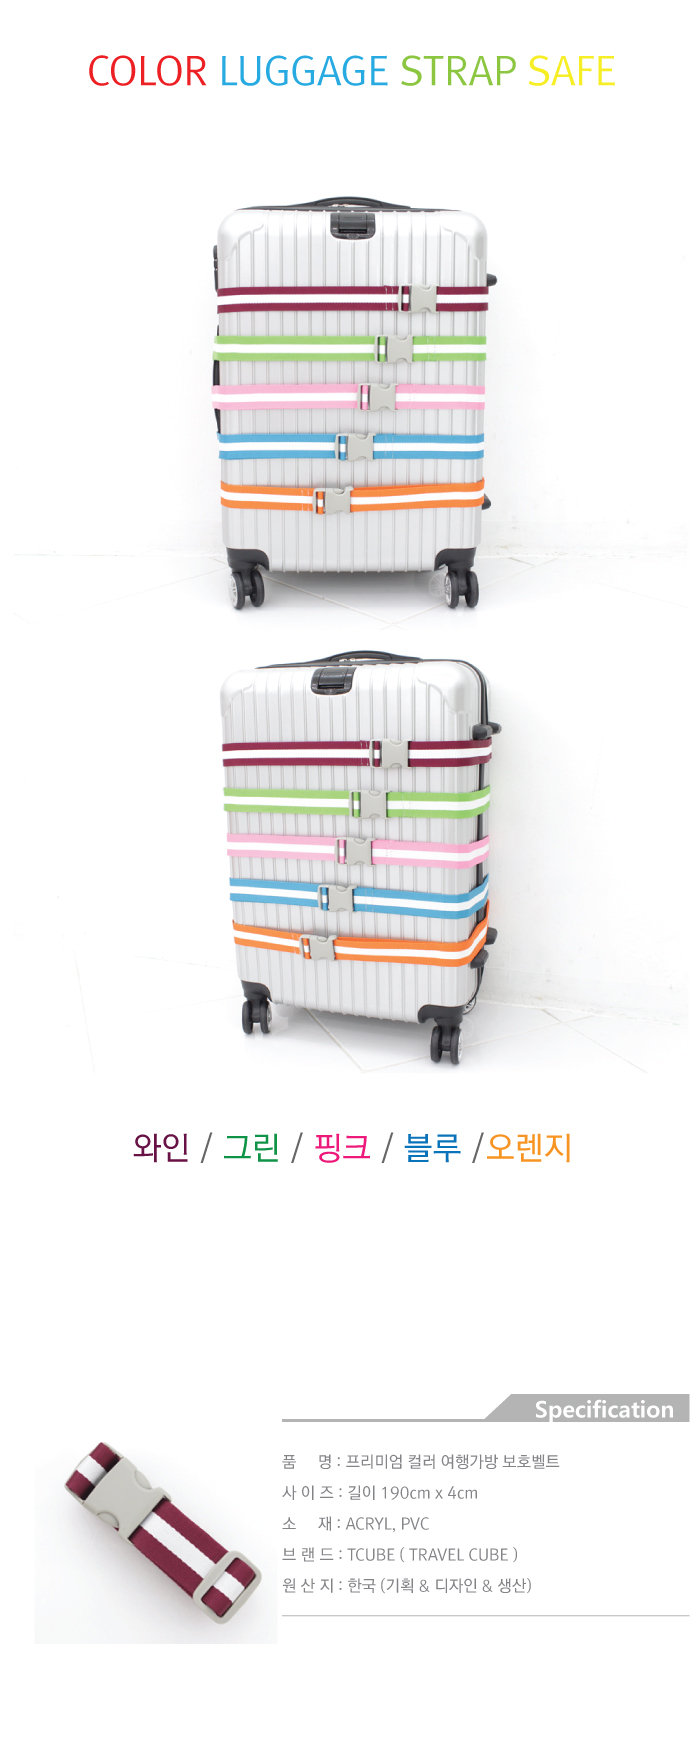 TCUBE - 터짐방지 프리미엄 여행가방 컬러 보호벨트 - 2개 세트 - 티큐브, 12,800원, 보호용품, 벨트/와이어